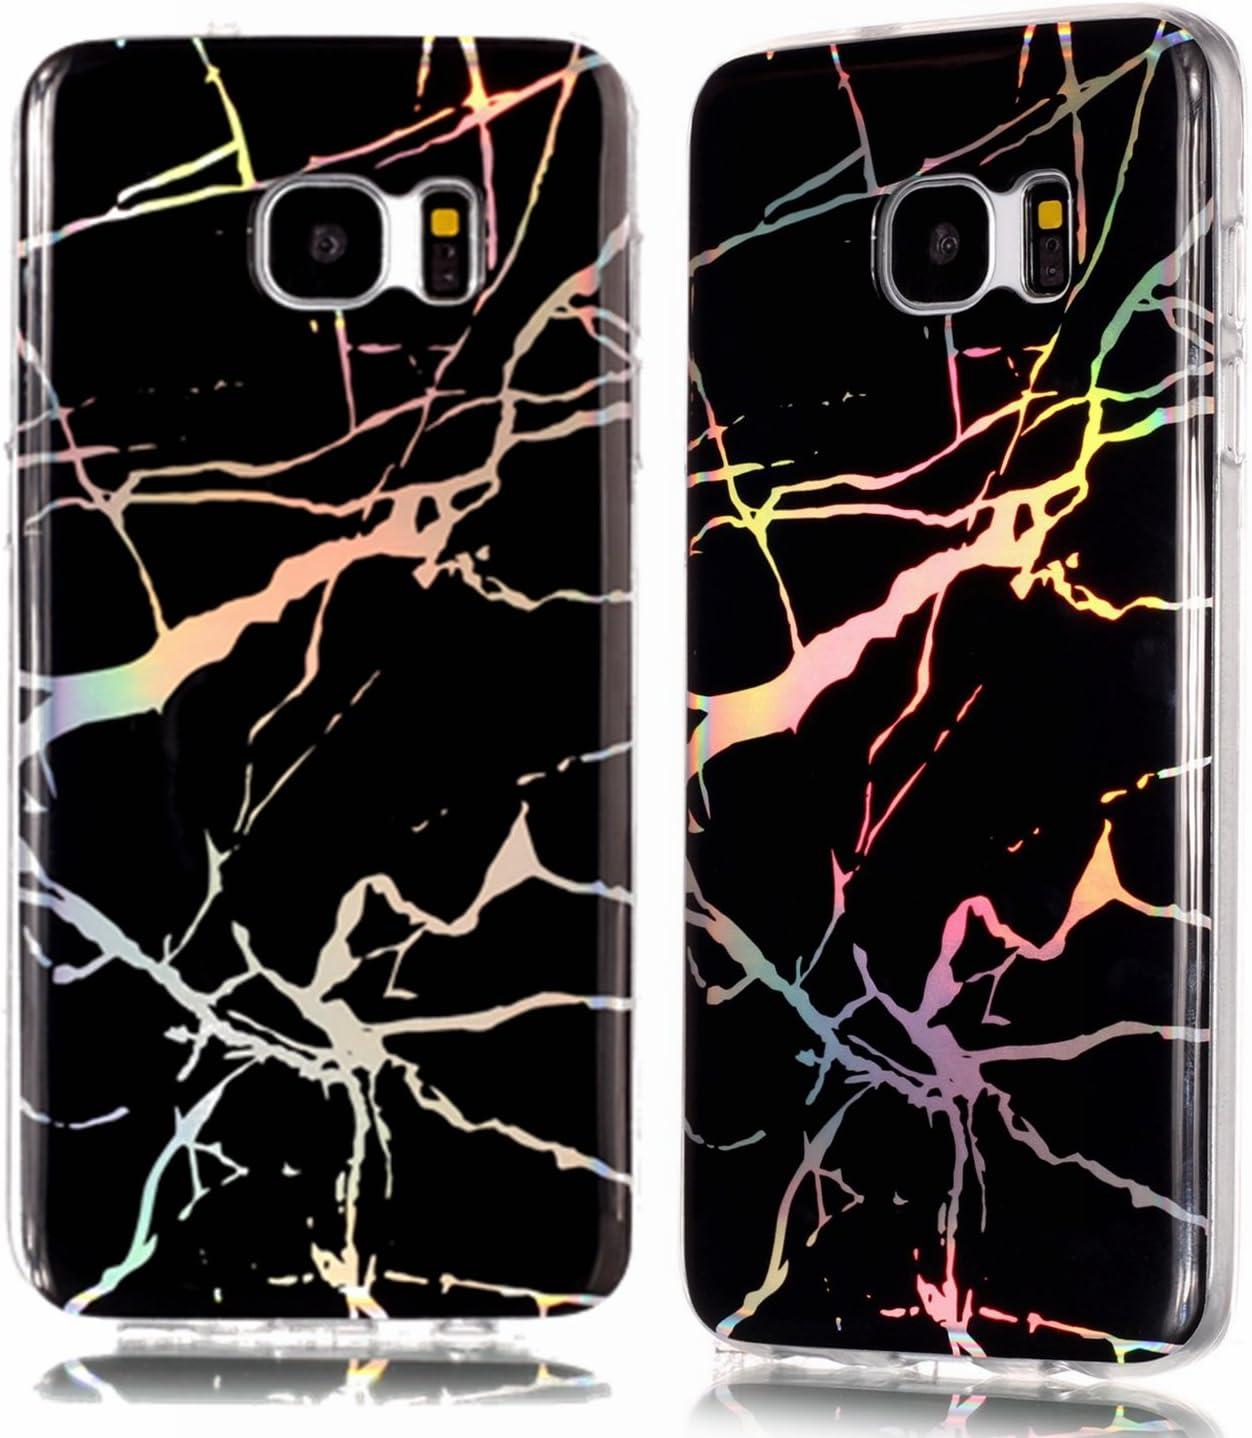 Galaxy S7 Edge Case,DAMONDY 3D Shiny Marble Glitter Ultra Thin Slim Back Skin Full Body Protective Soft TPU Rubber Bumper Case Phone Cover for Samsung Galaxy S7 Edge-Black